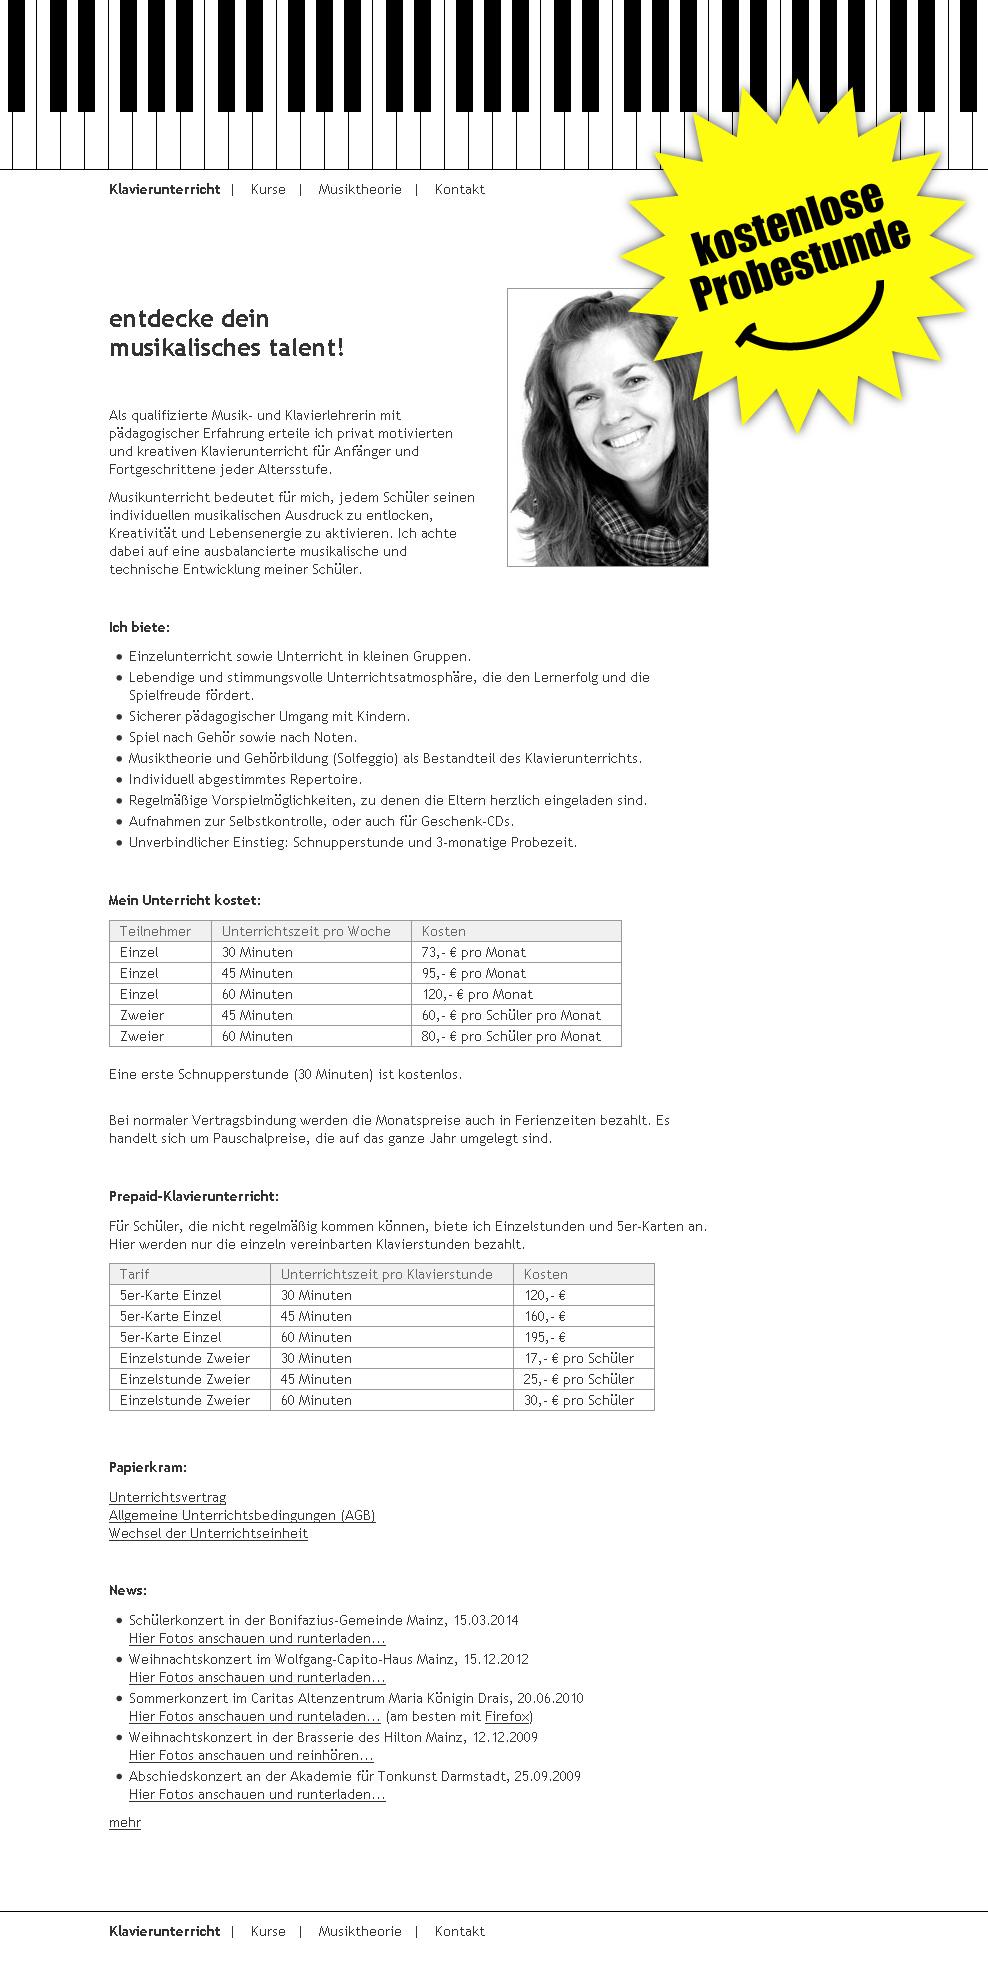 Judit-Feigl.de. WebSite for the piano teacher Judit Feigl.